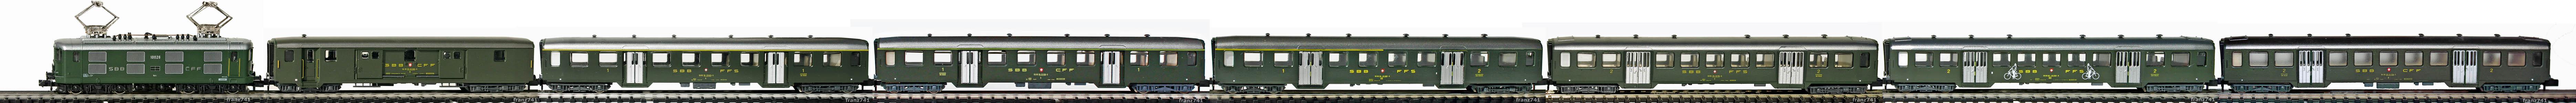 Epoche-IV-SBB-Personenzug_Re-4-4-I-Elok-Leichtstahlwagen-AR